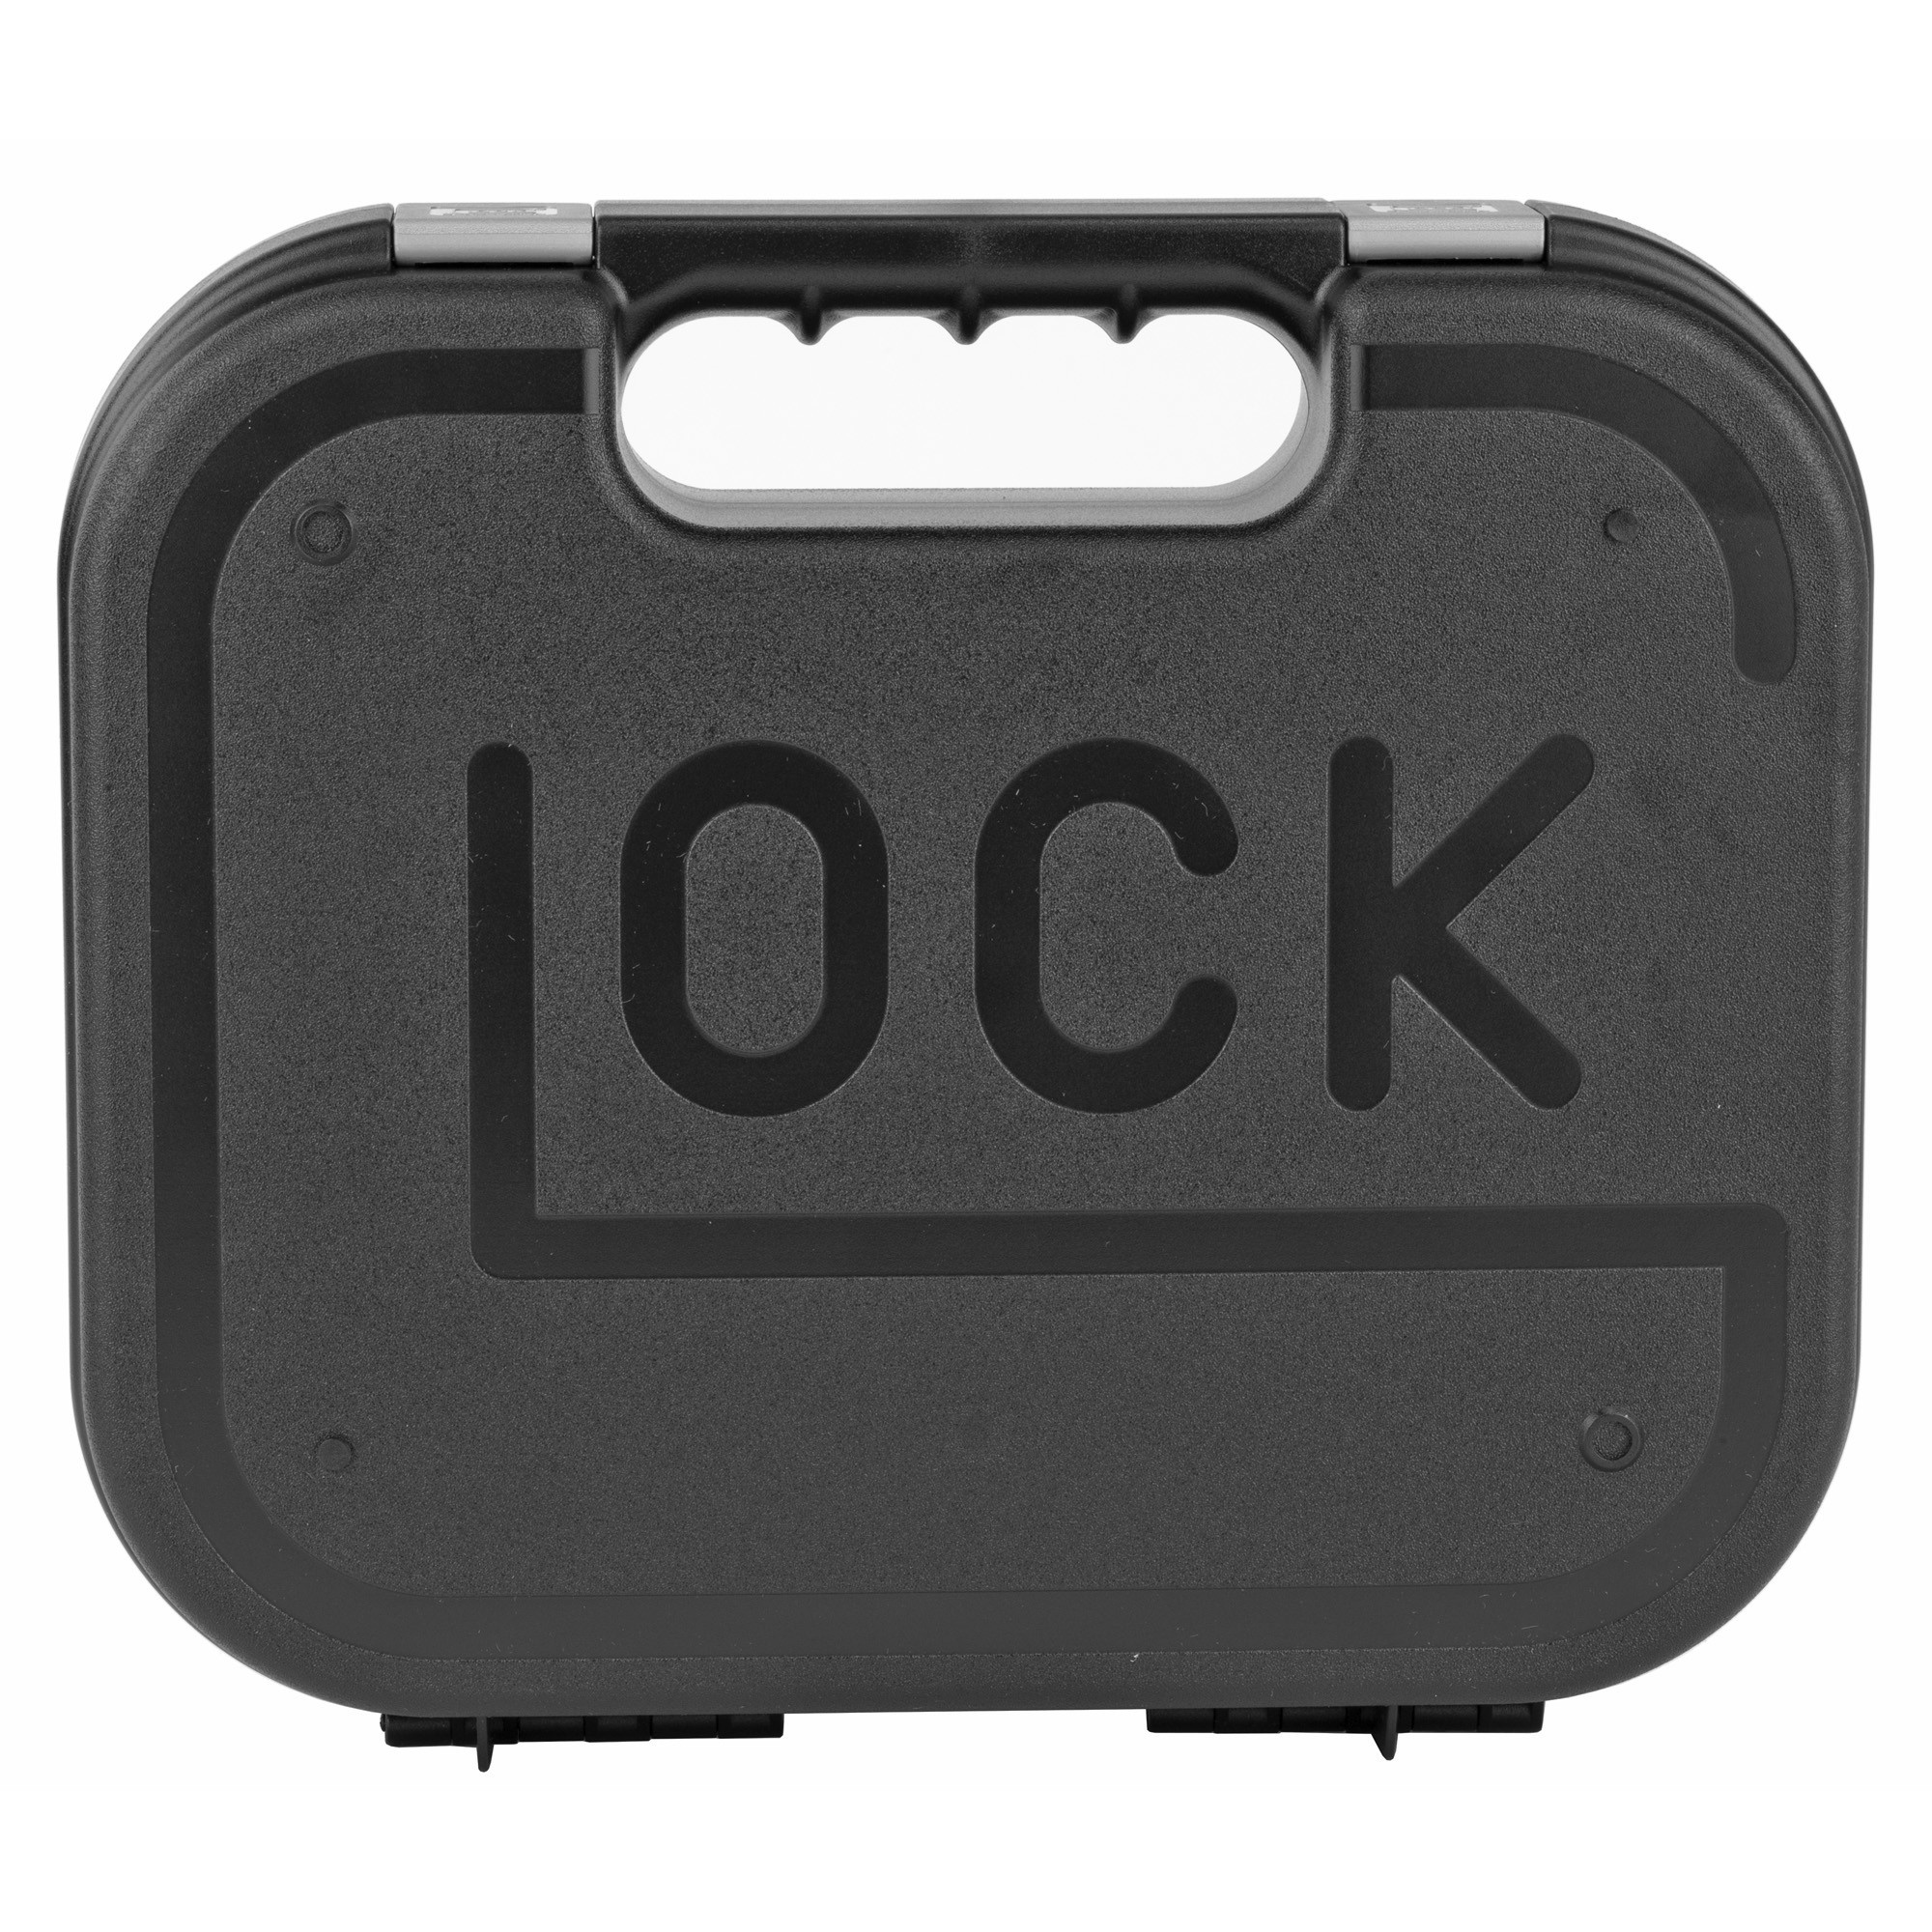 Glock Hard Pistol Case